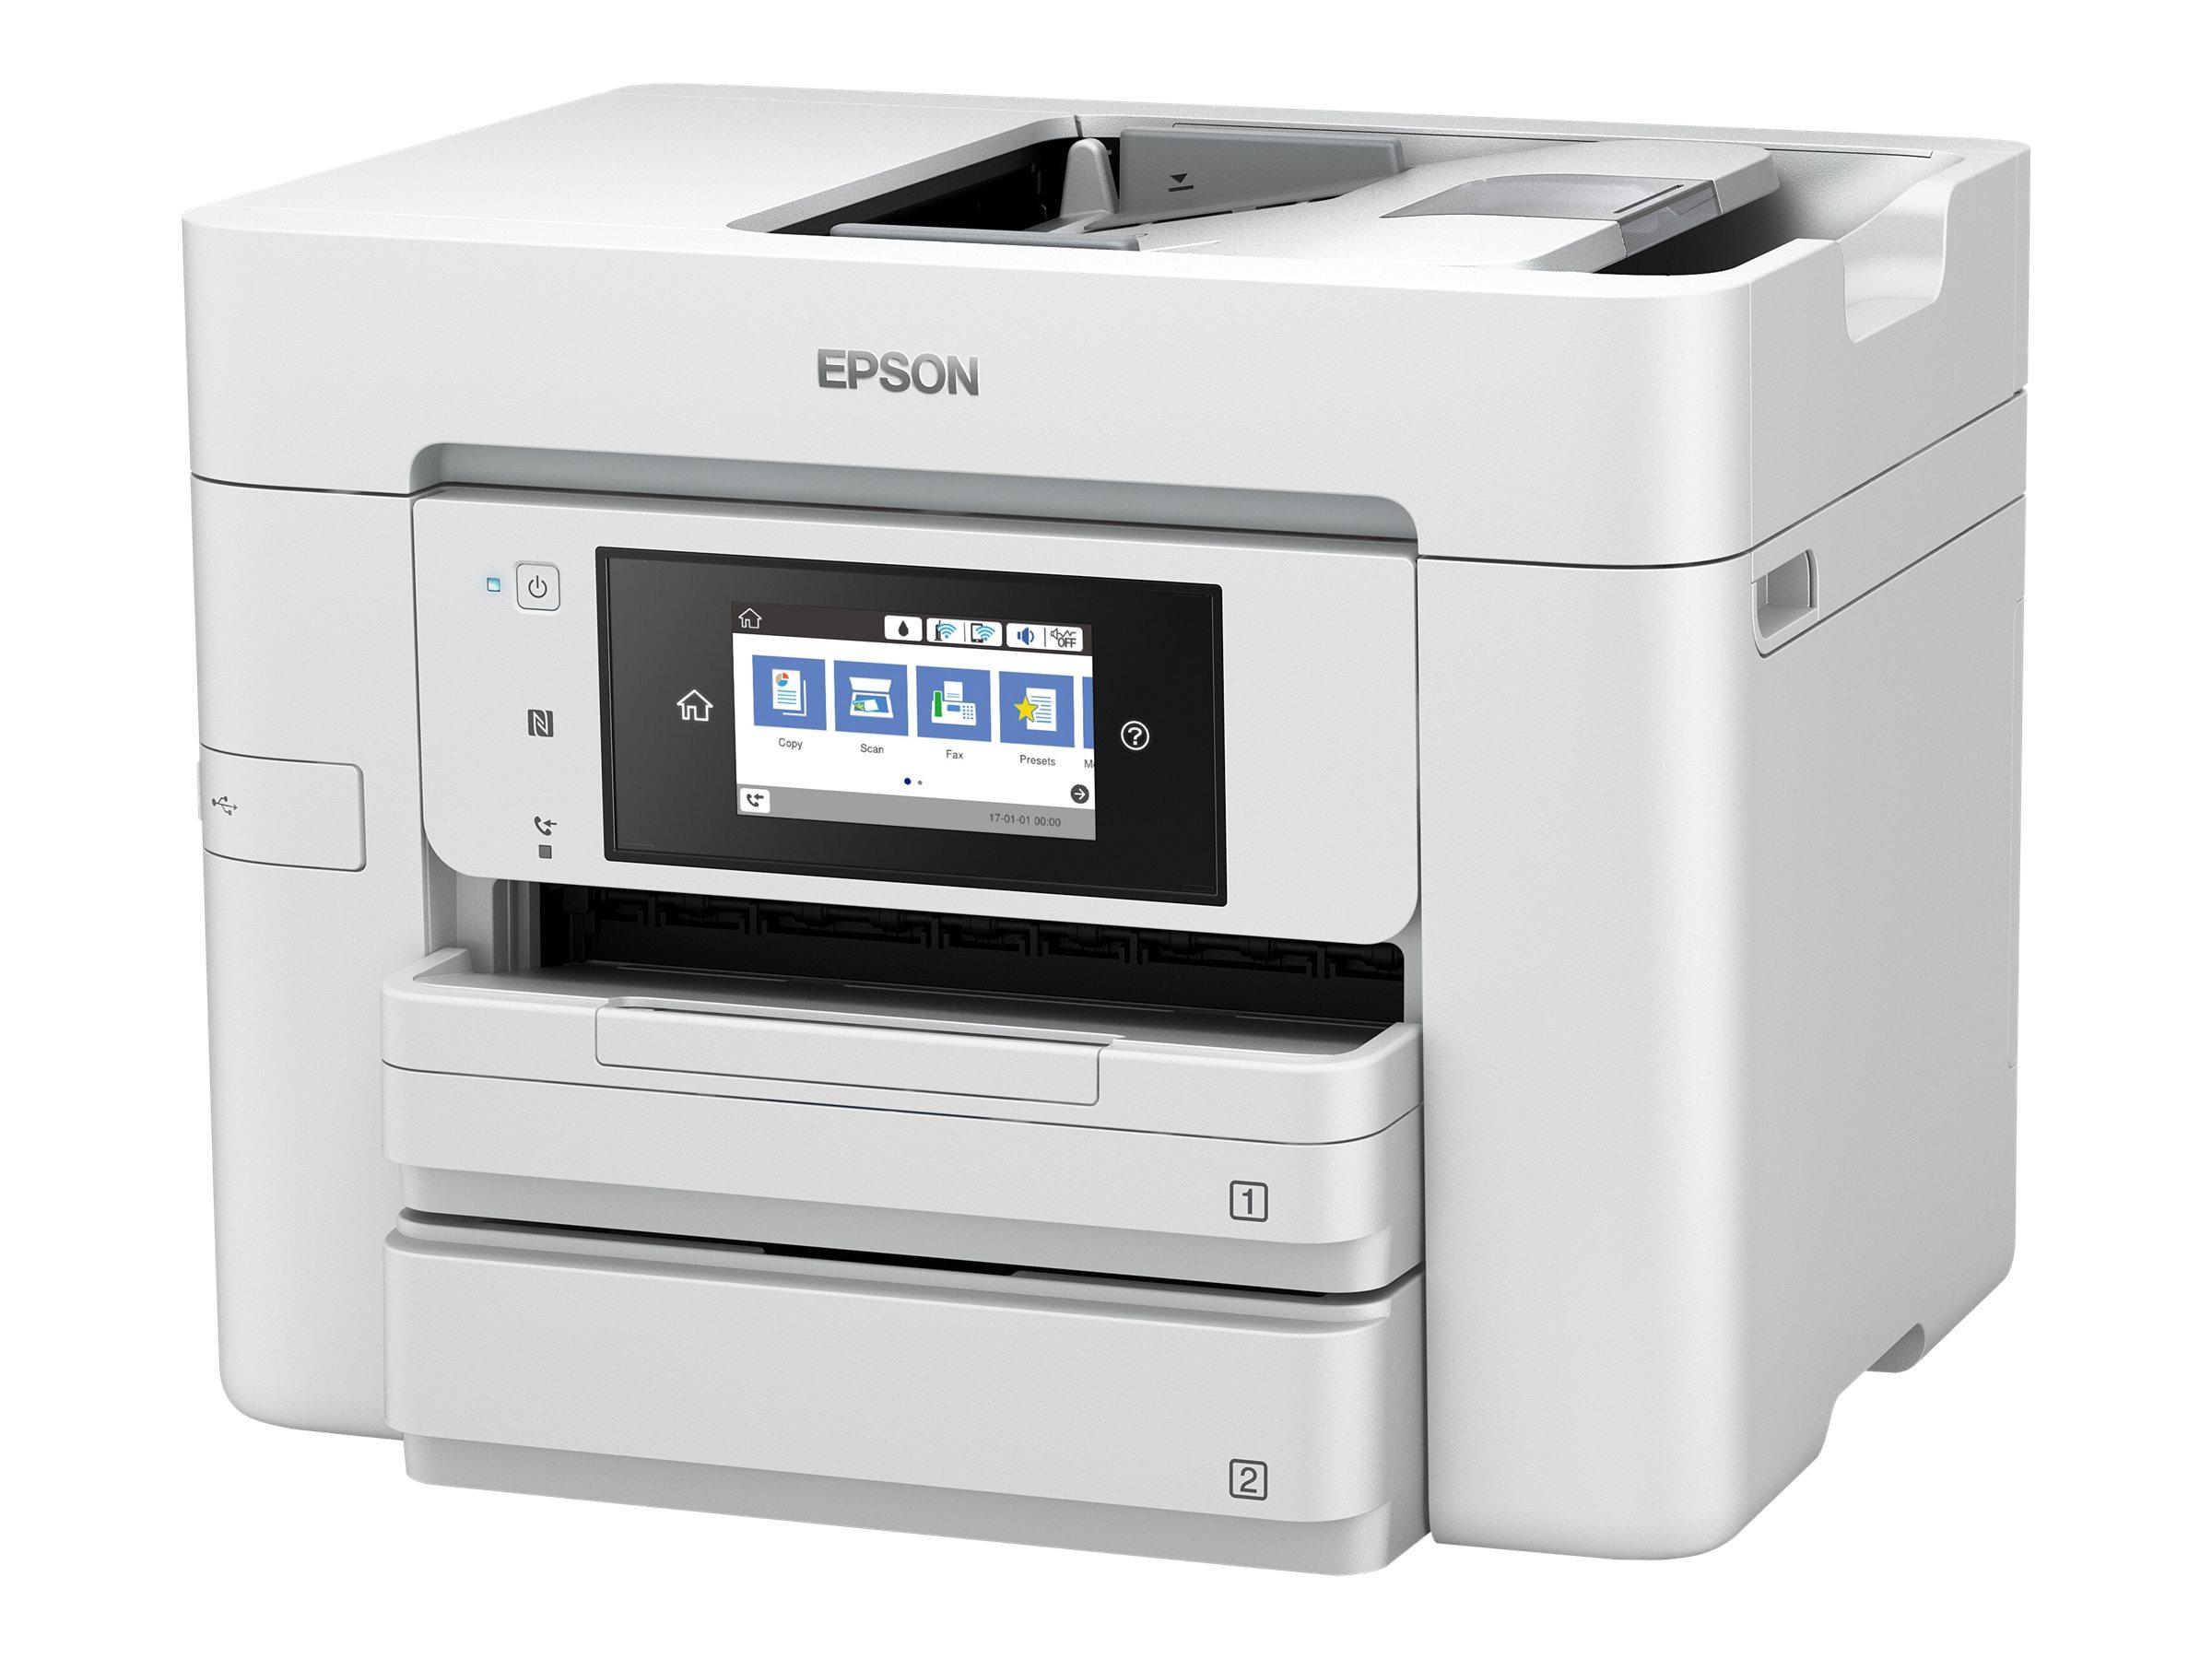 Epson WorkForce Pro WF-4745DTWF - Multifunktionsdrucker - Farbe - Tintenstrahl - A4 (210 x 297 mm) (Original) - A4/Legal (Medien